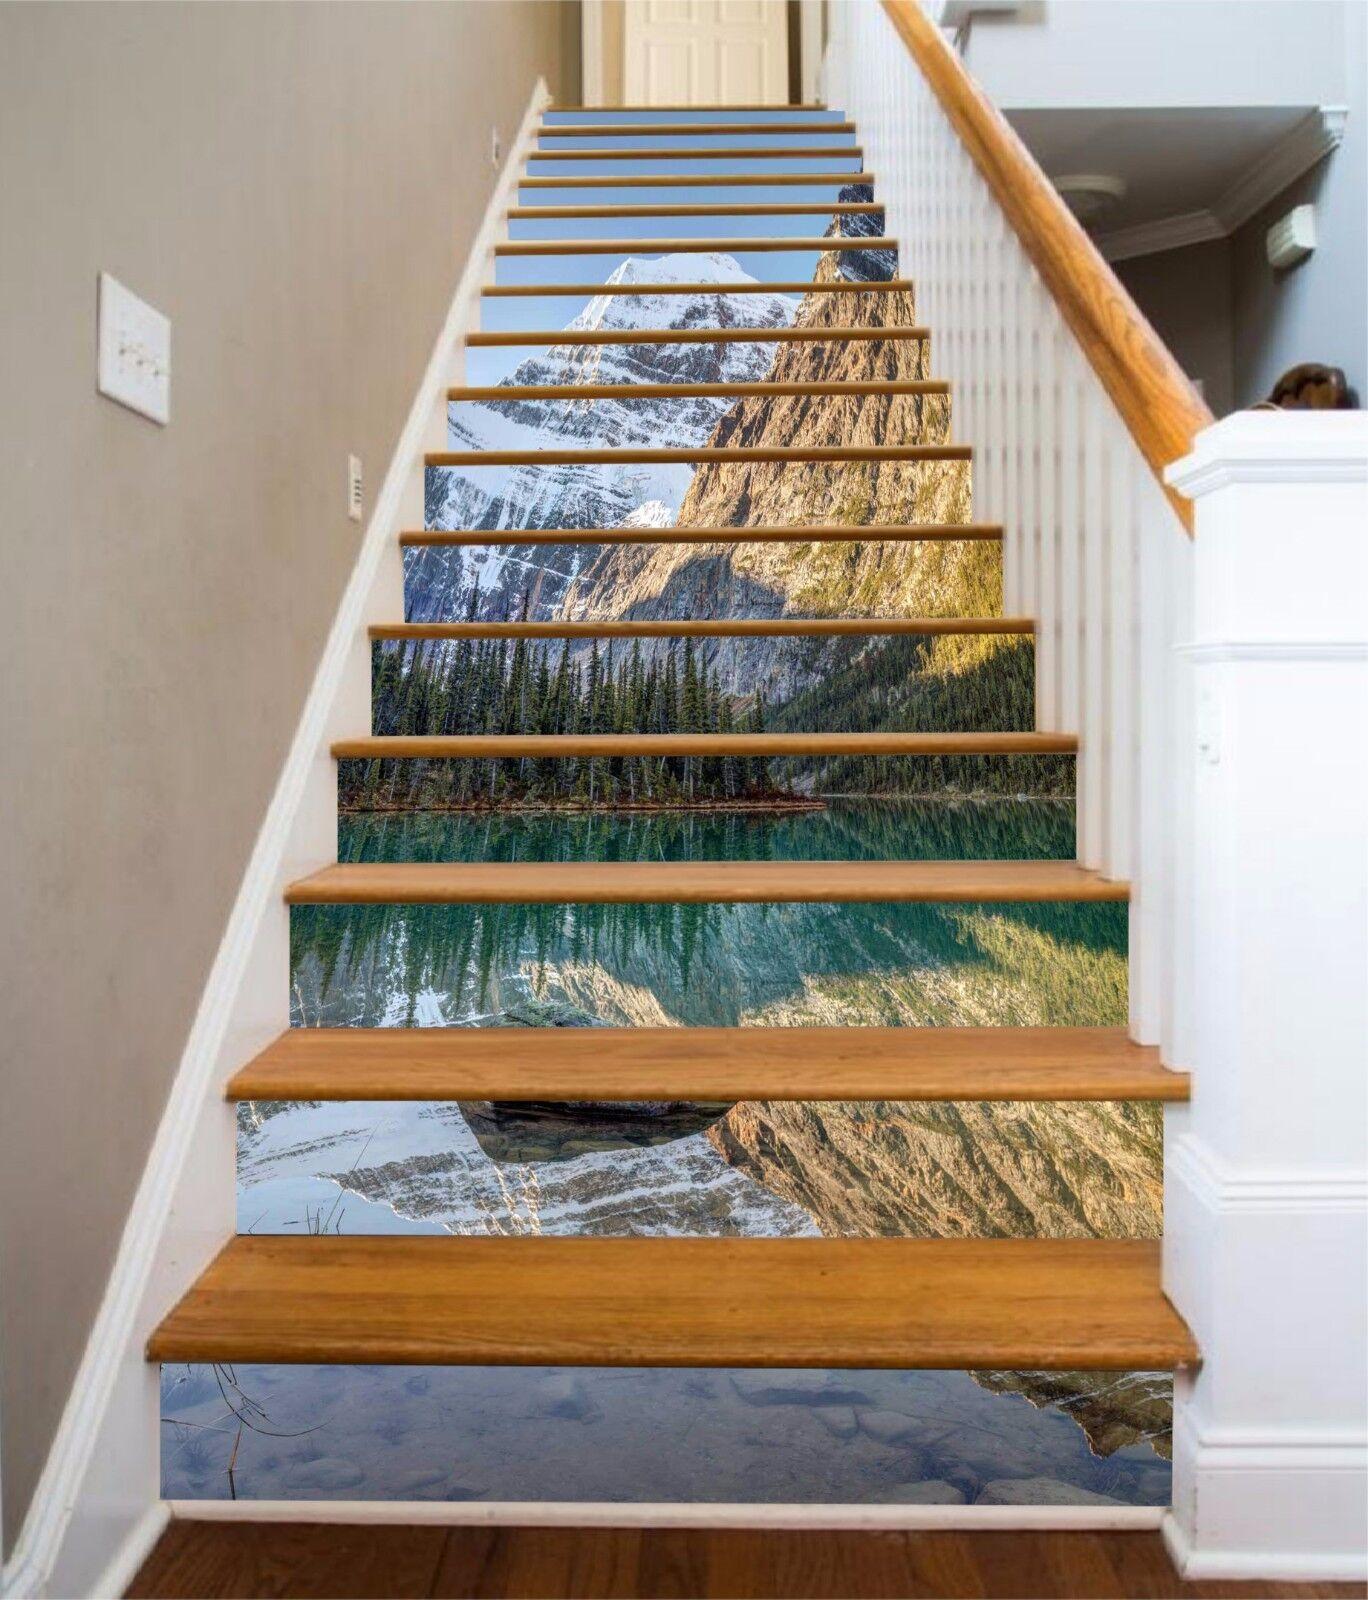 3D Woods lake 2 Stair Risers Decoration Photo Mural Vinyl Decal Wallpaper UK